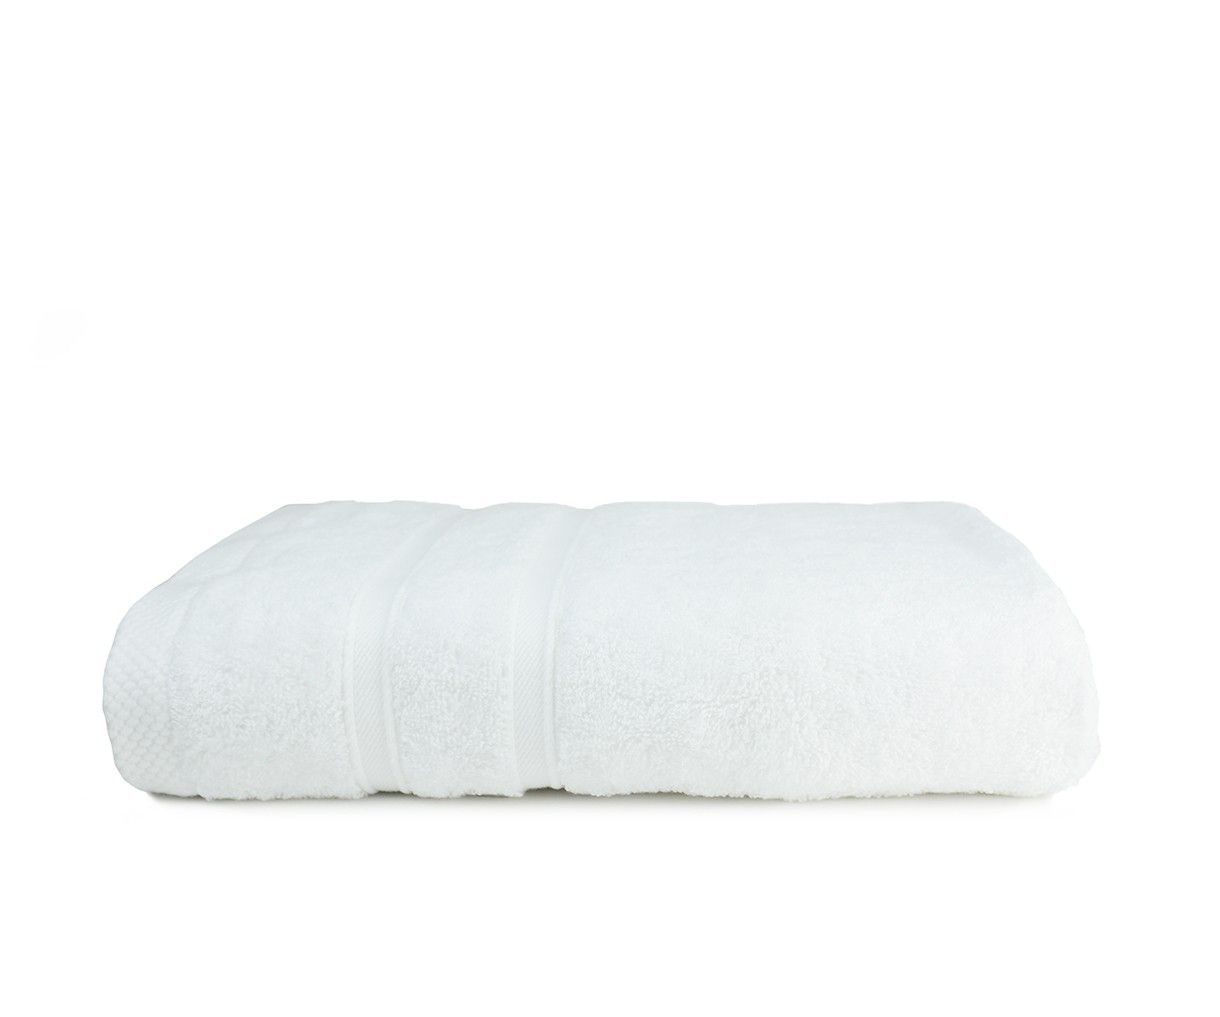 The One Towelling Bamboo Handdoek 50 X 100 White